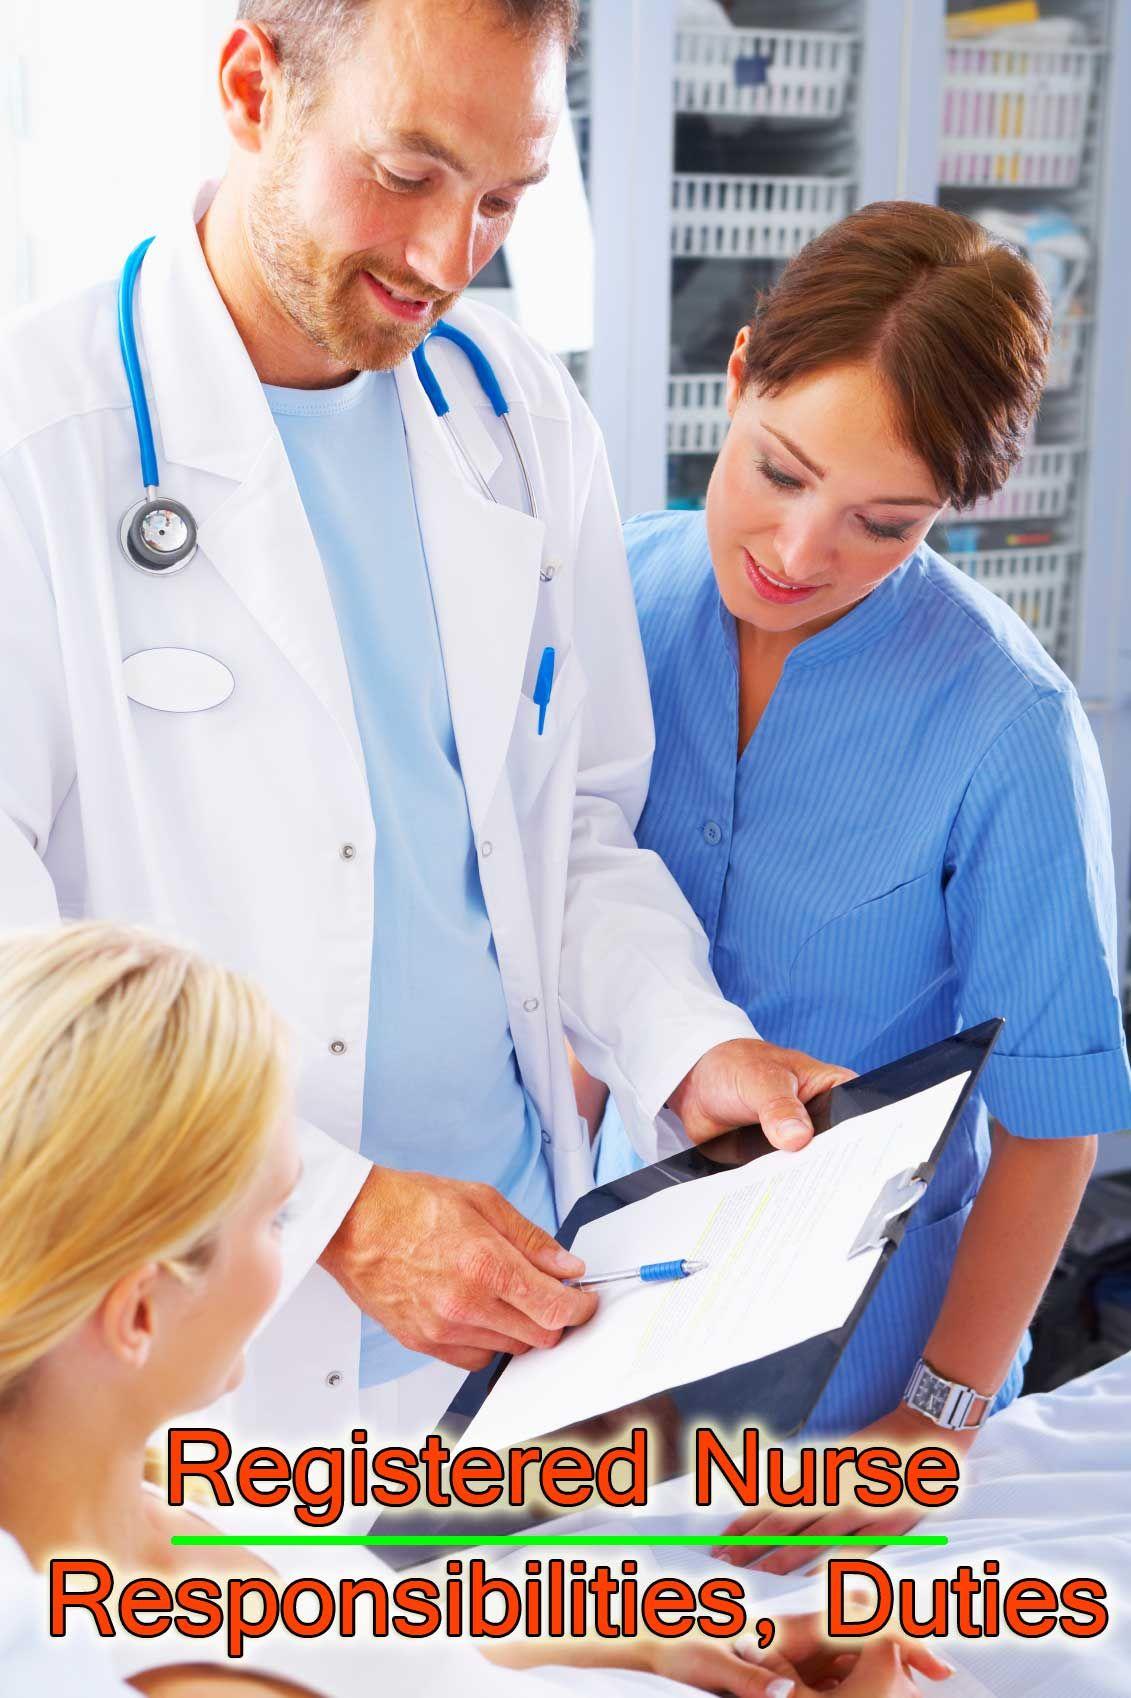 Registered Nurse Responsibilities, Duties and Job